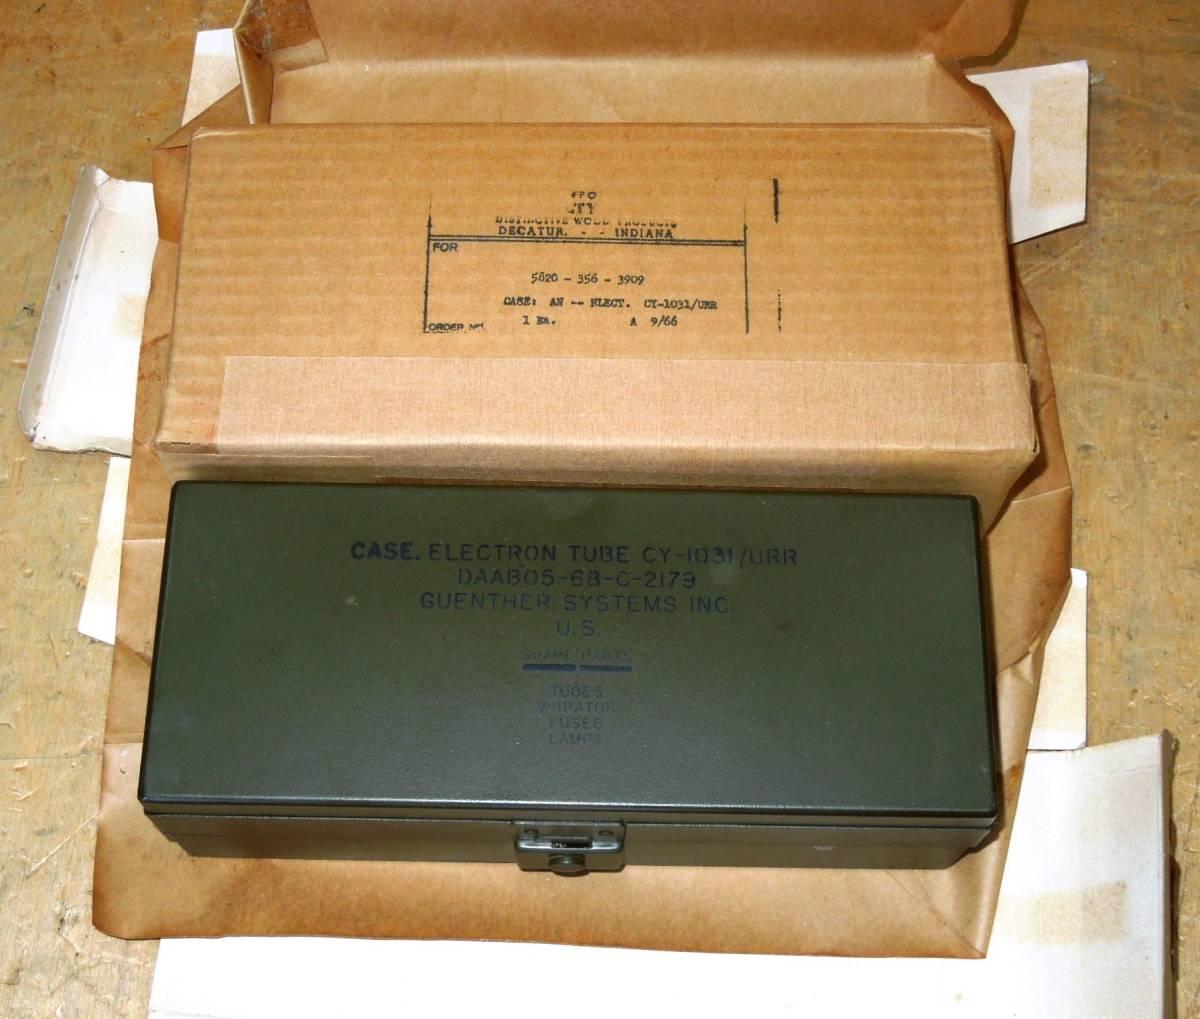 CY-1031/URR 汎用性無線機の予備品箱 未使用品_画像5